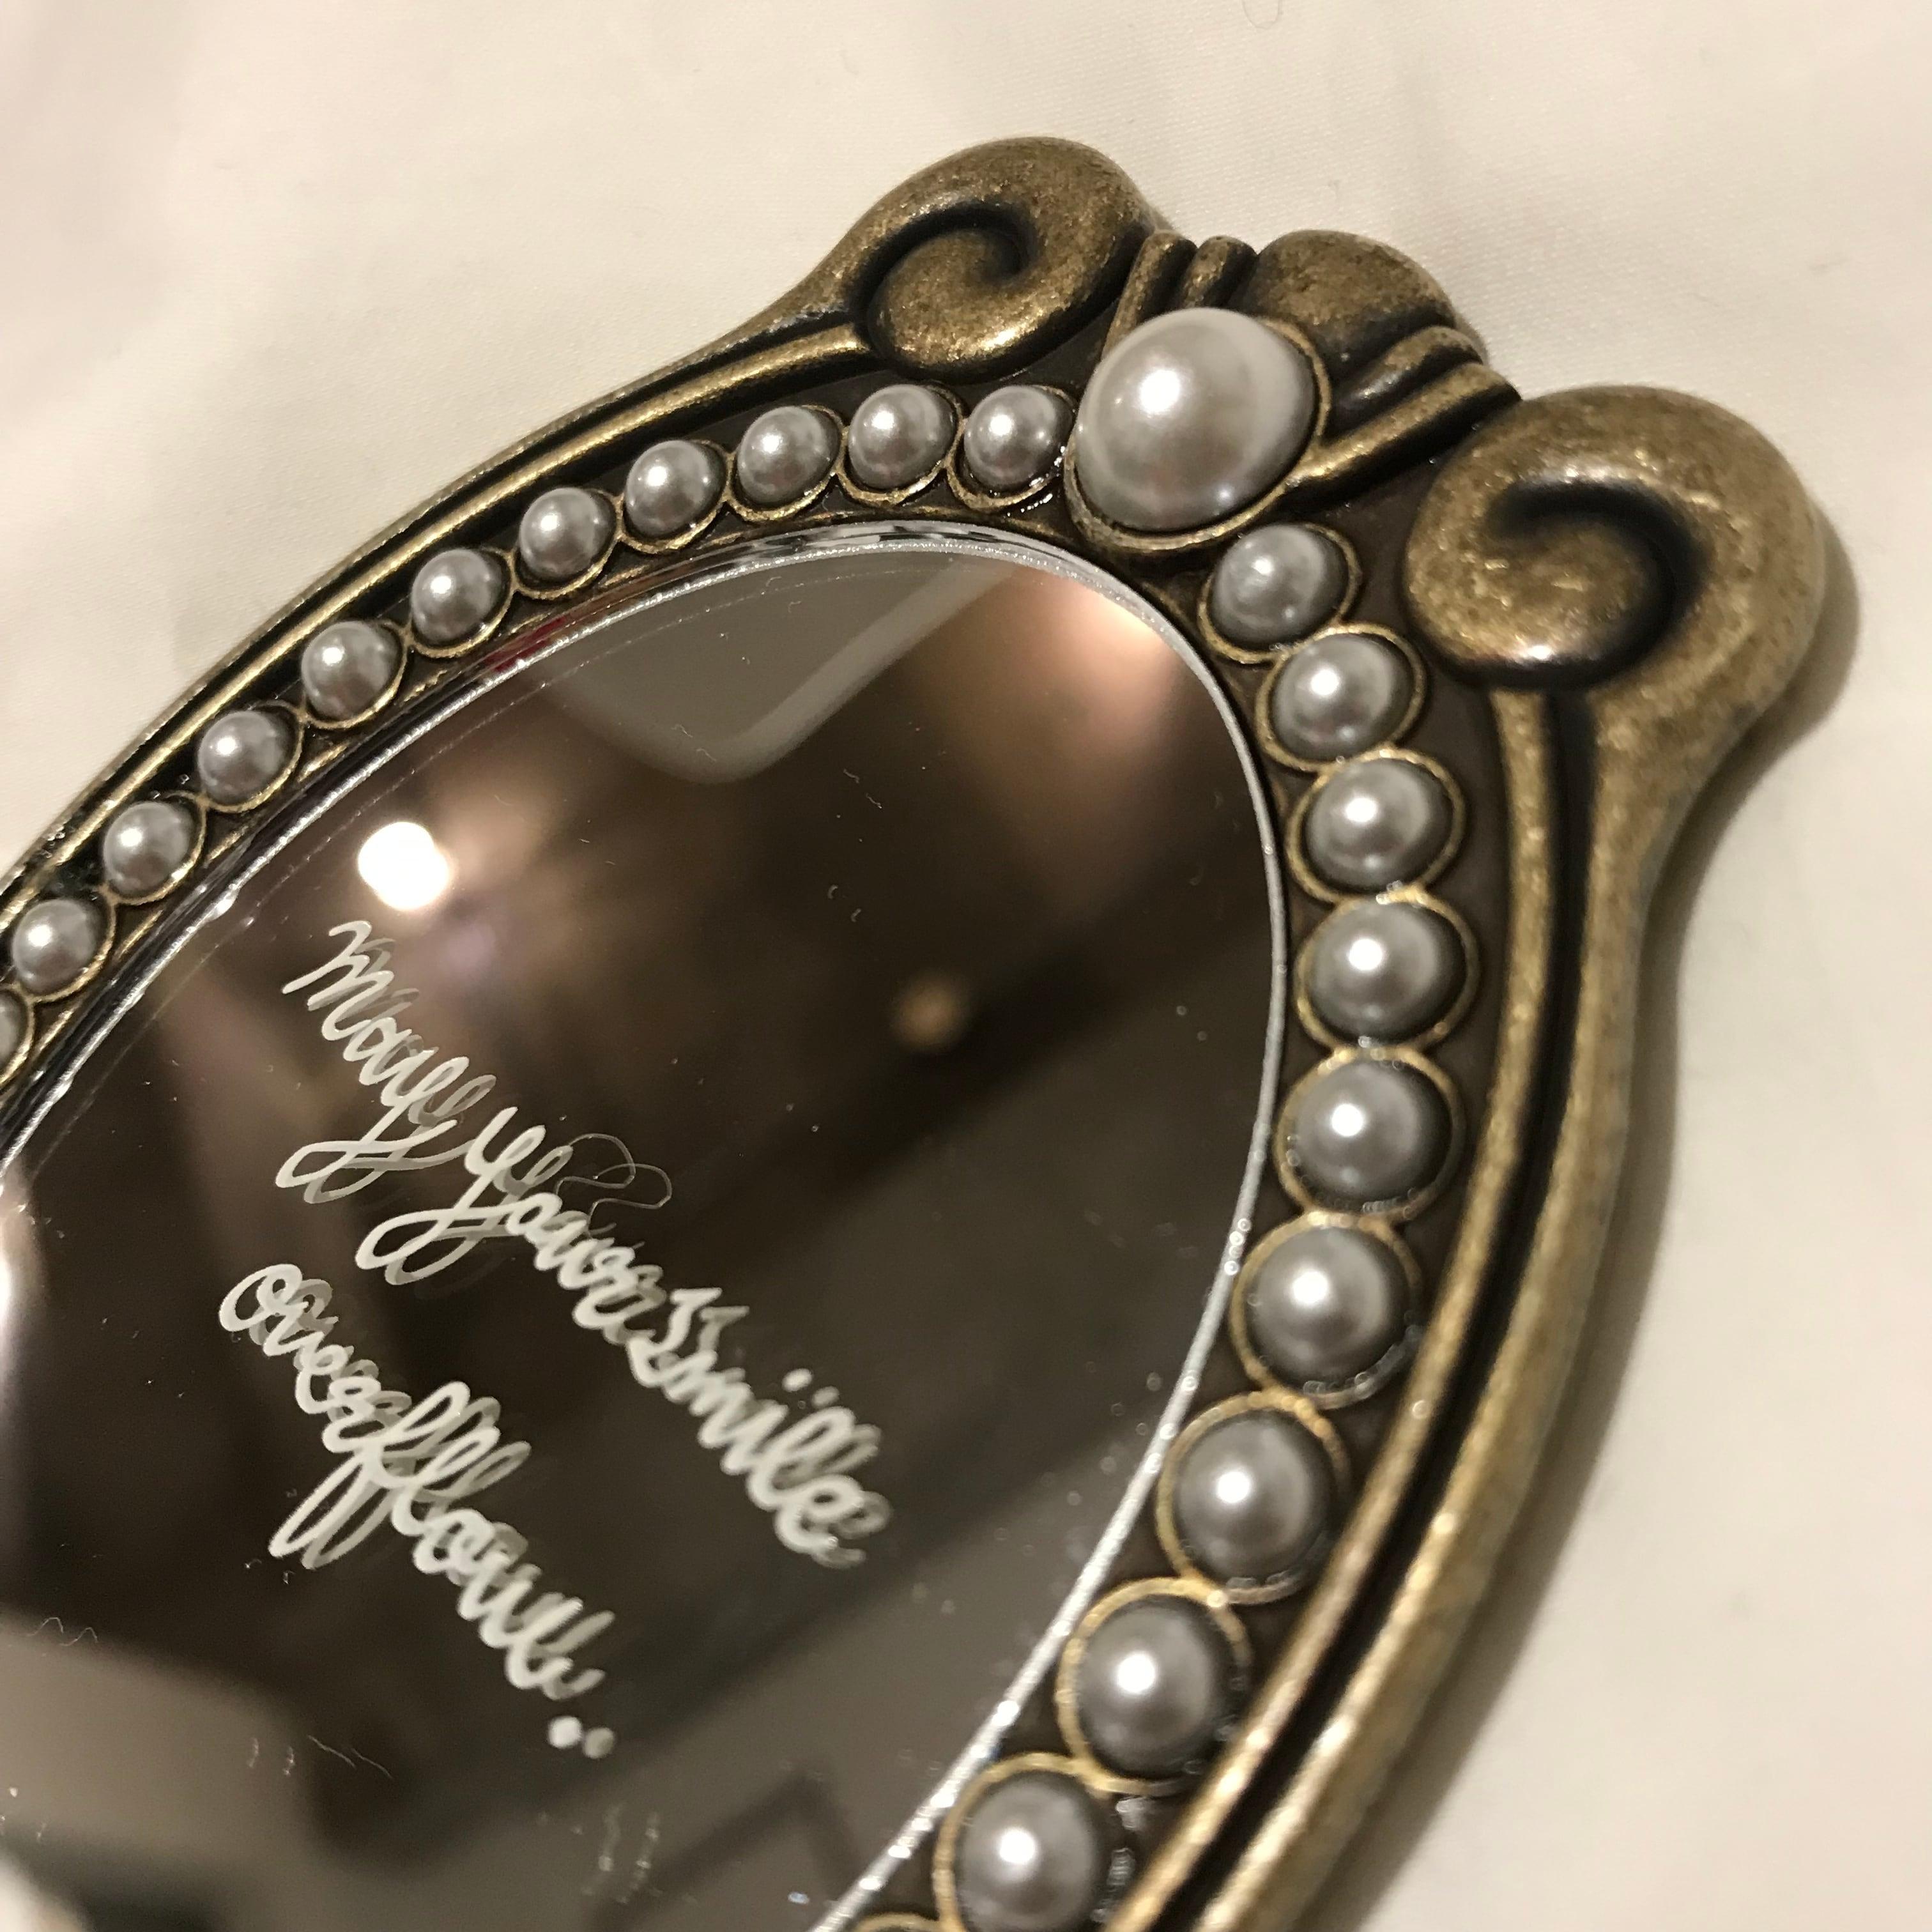 Cherily original mirror